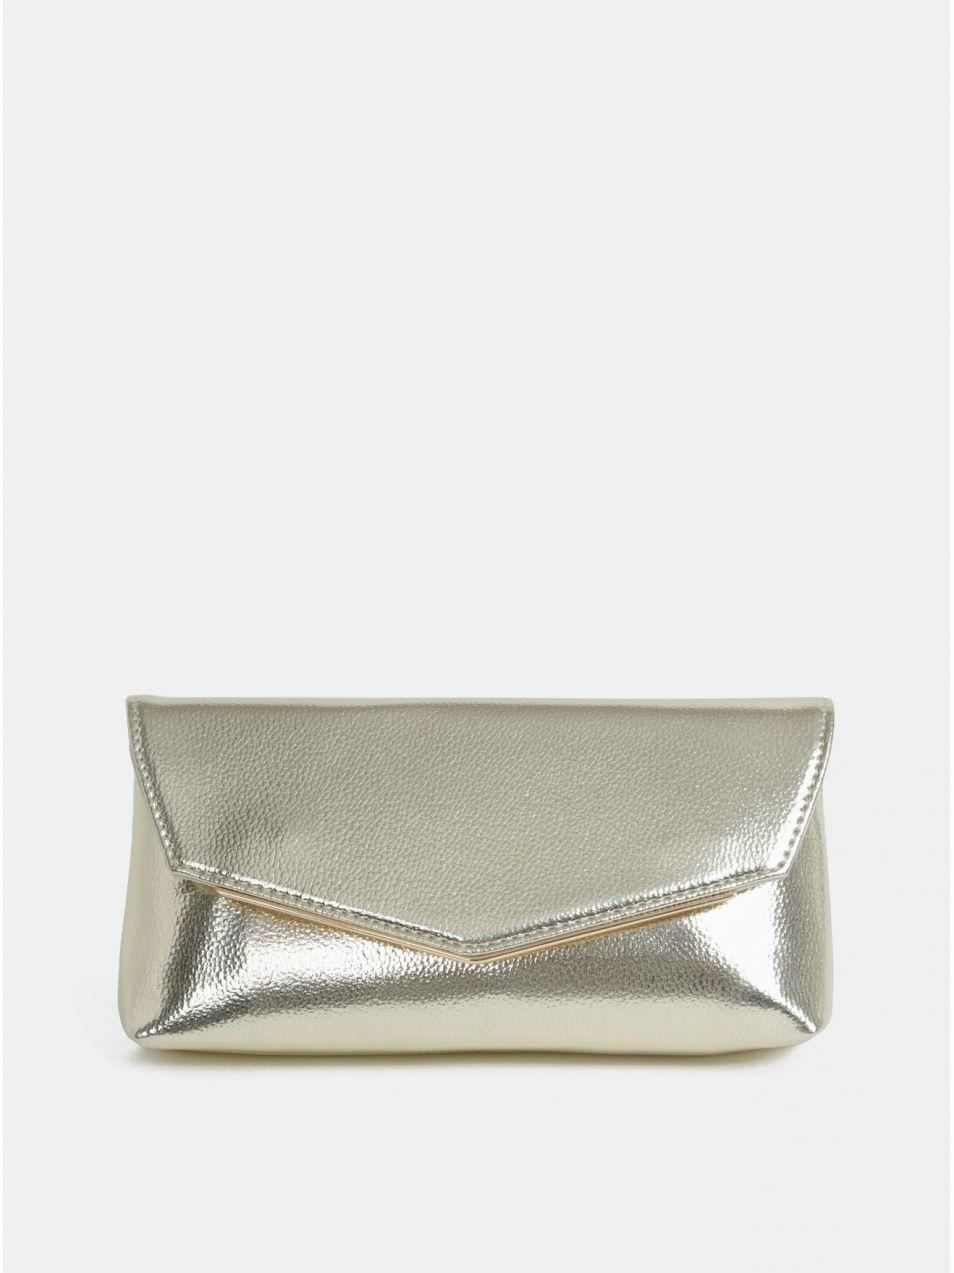 9f916bb04c Listová kabelka v zlatej farbe Dorothy Perkins značky Dorothy ...